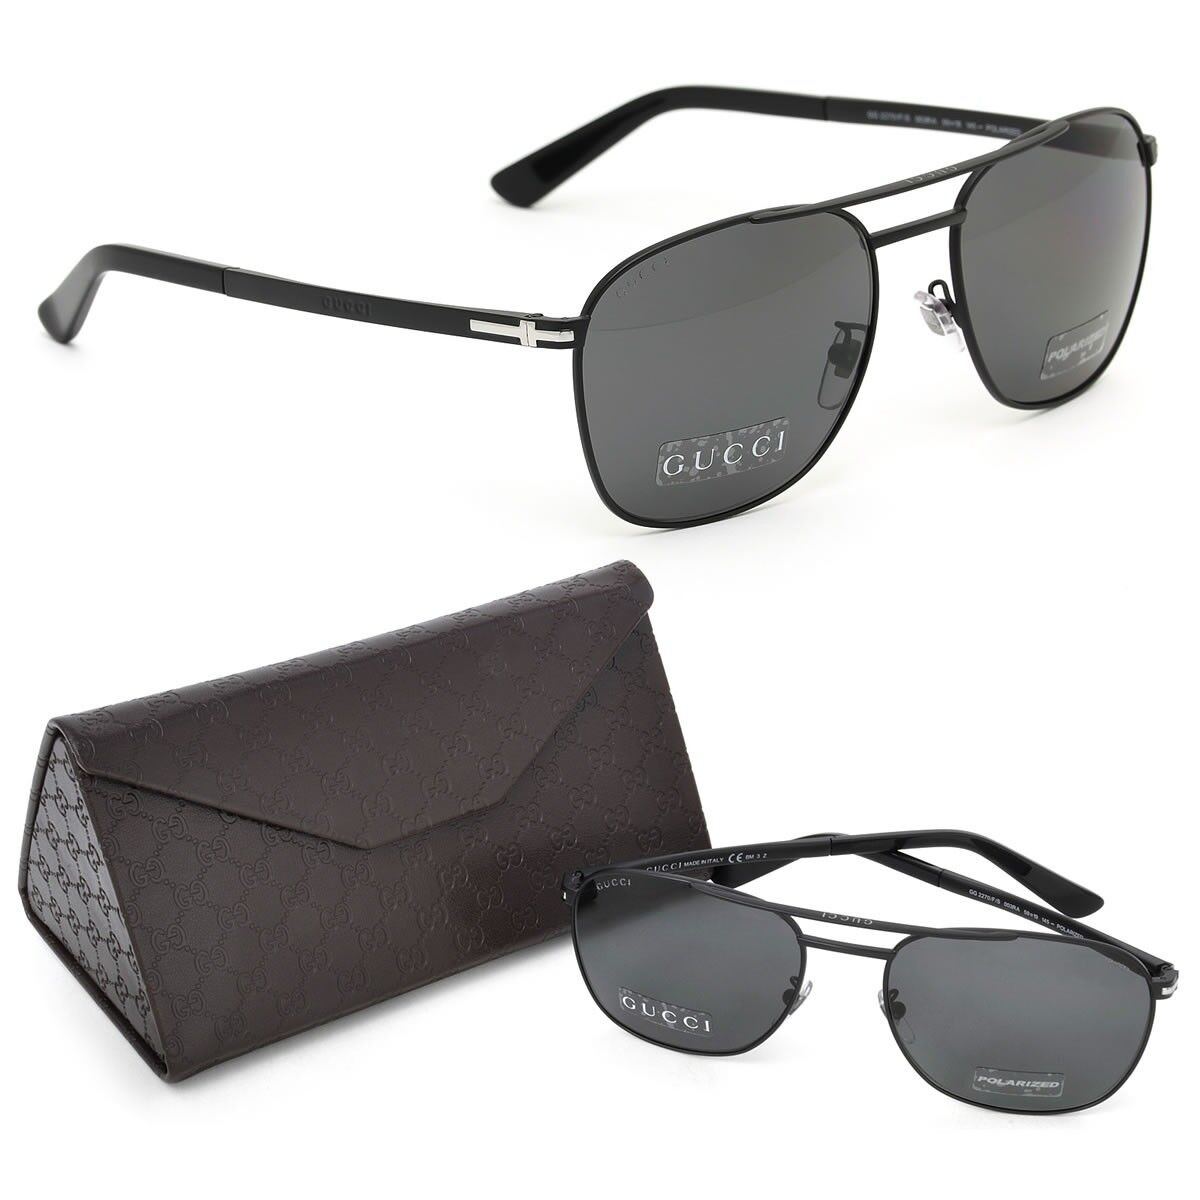 30a94d72c3 Gucci Men s GG 2270 f s 003ra Polarized Sunglasses Matte Black for sale  online